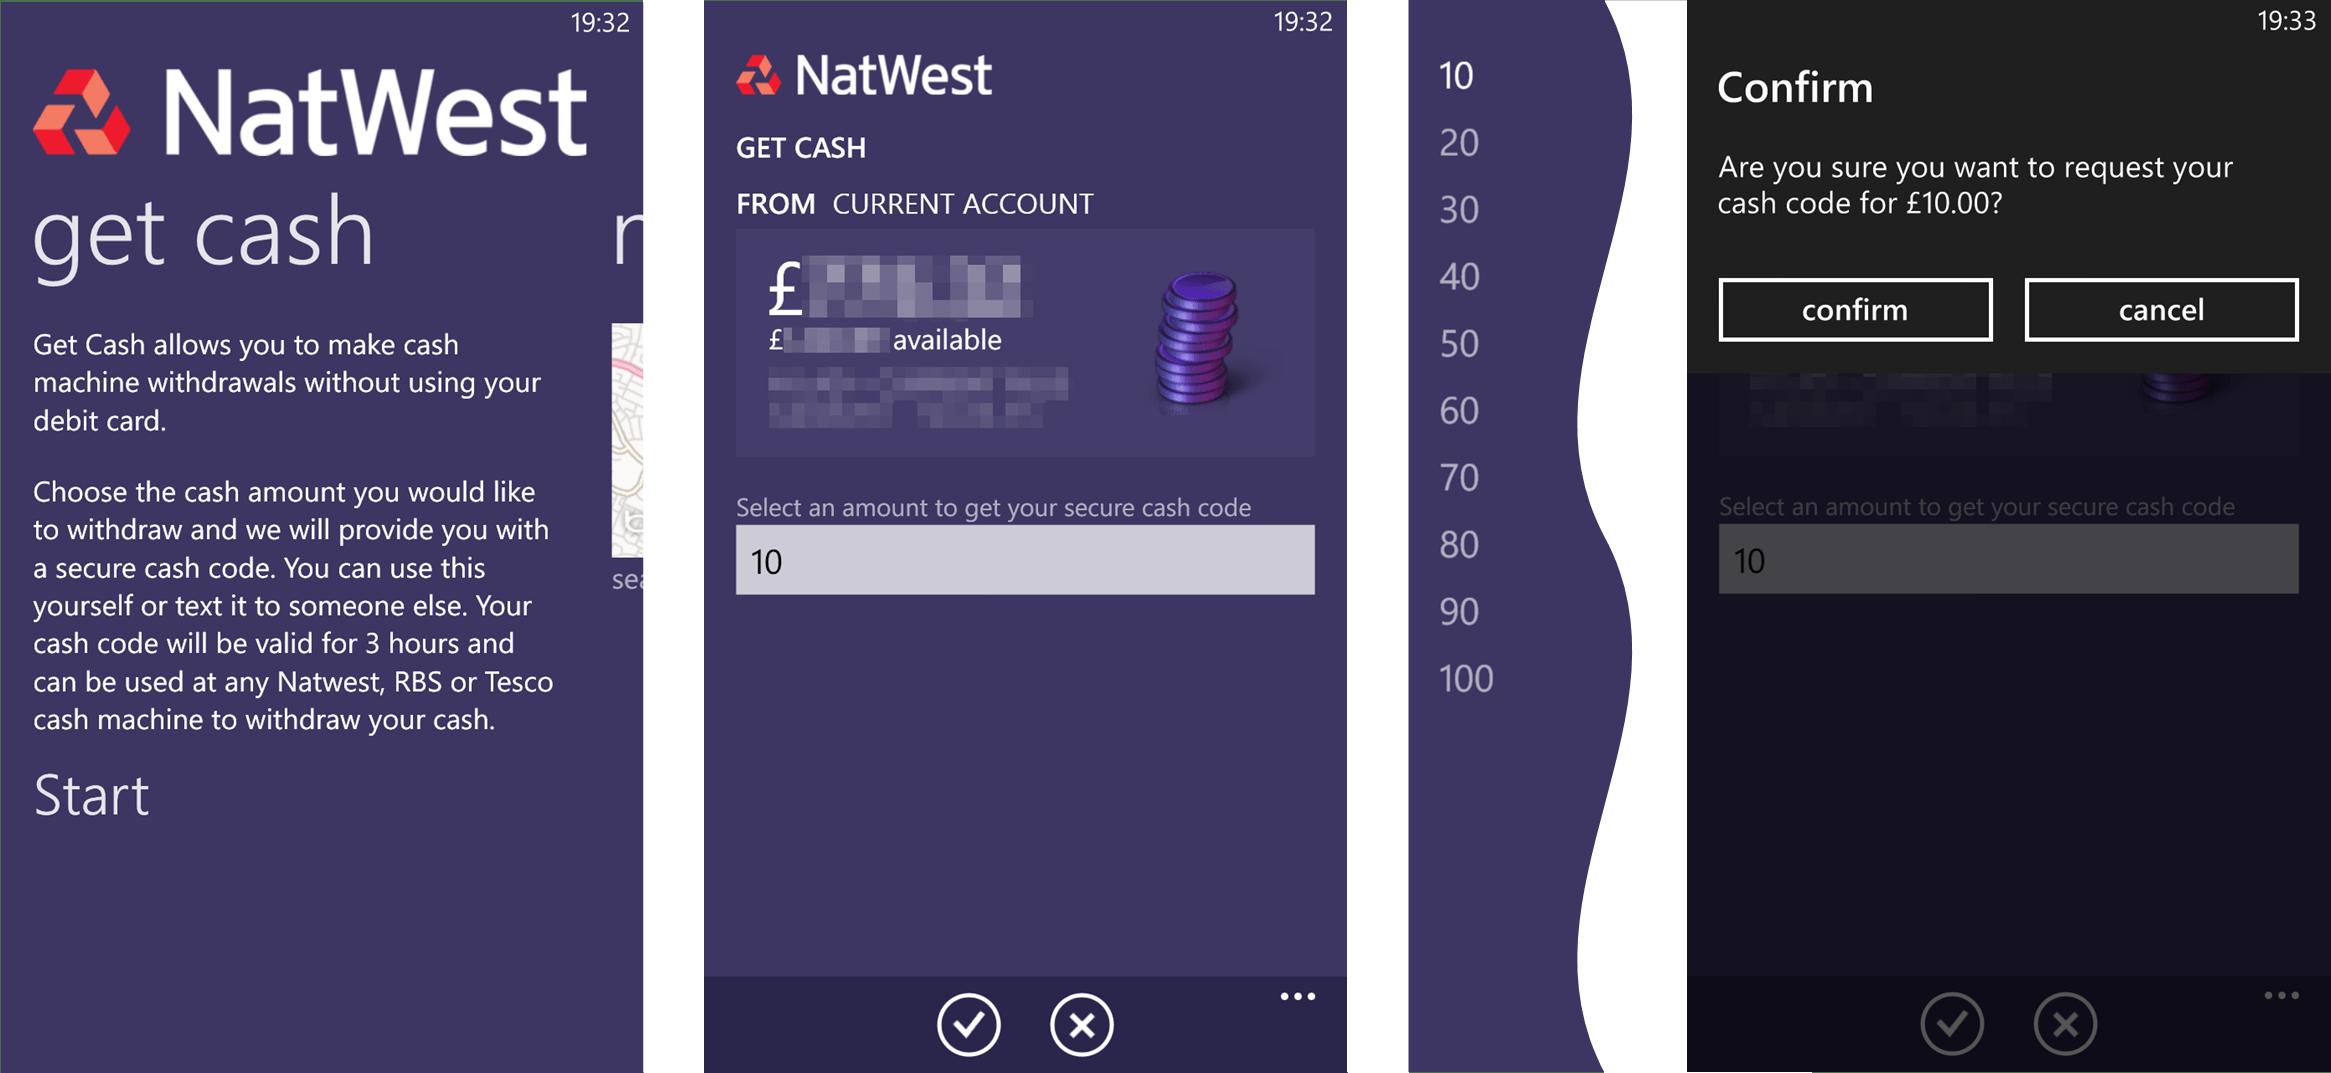 NatWest App (5) Get Cash